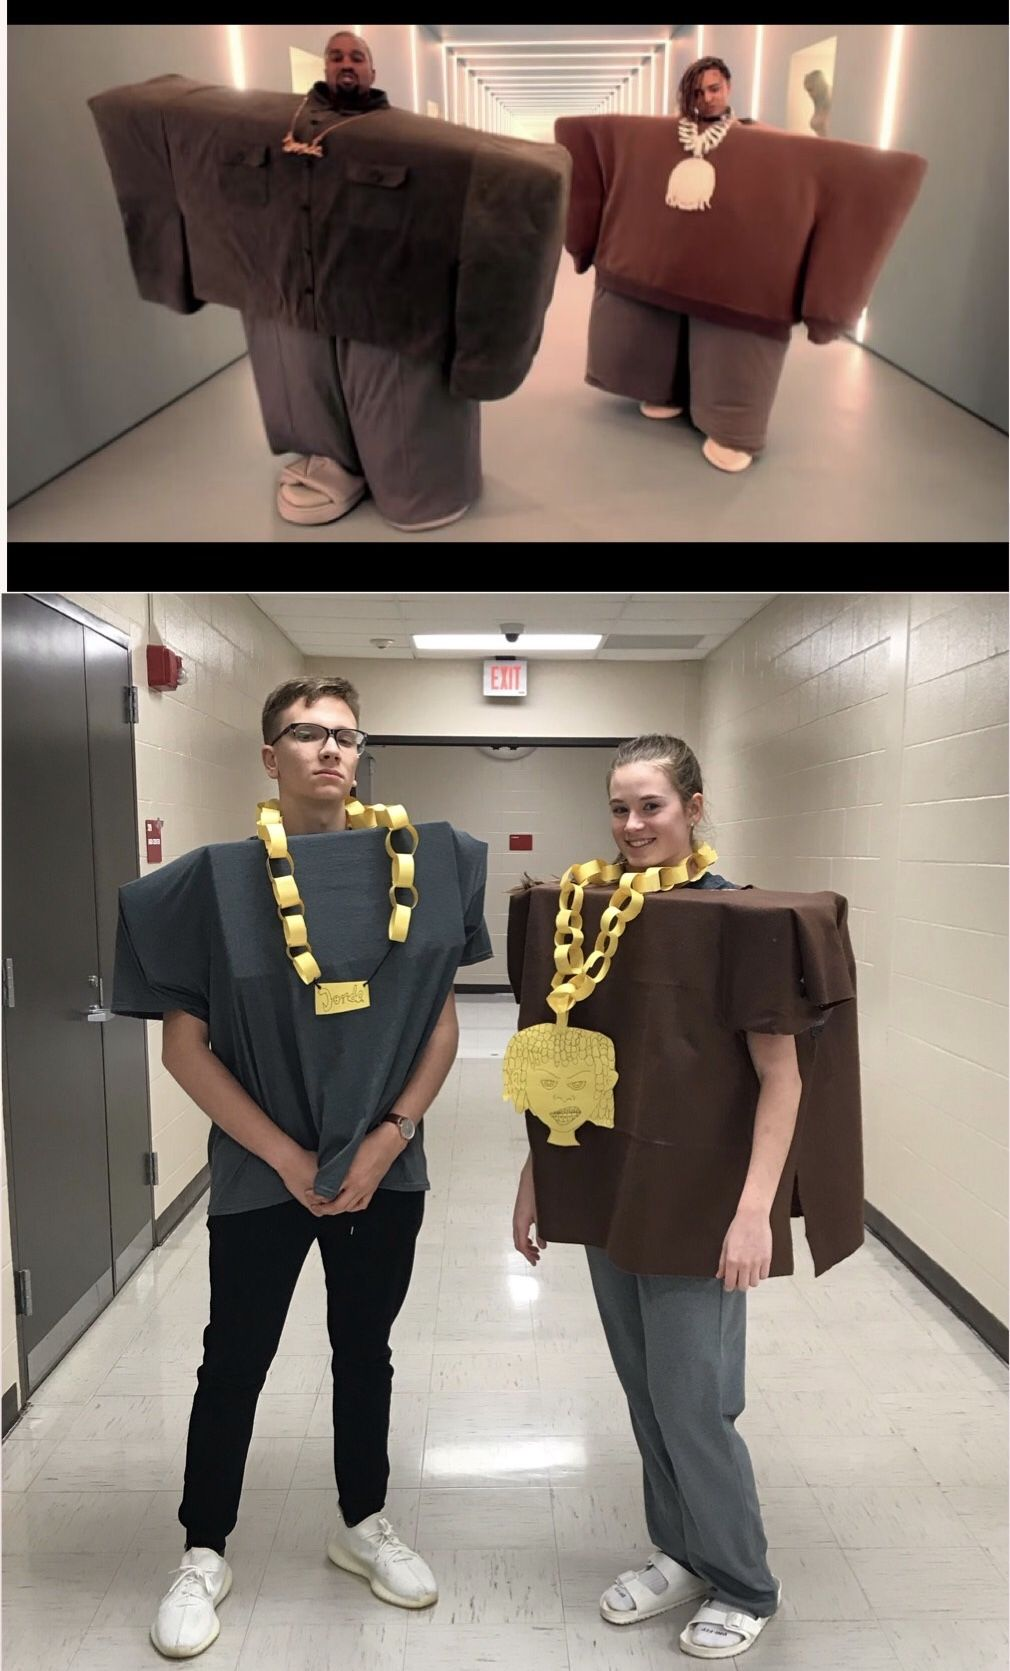 Meme day, Kanye \u201cI love it\u201d meme costume Spirit week